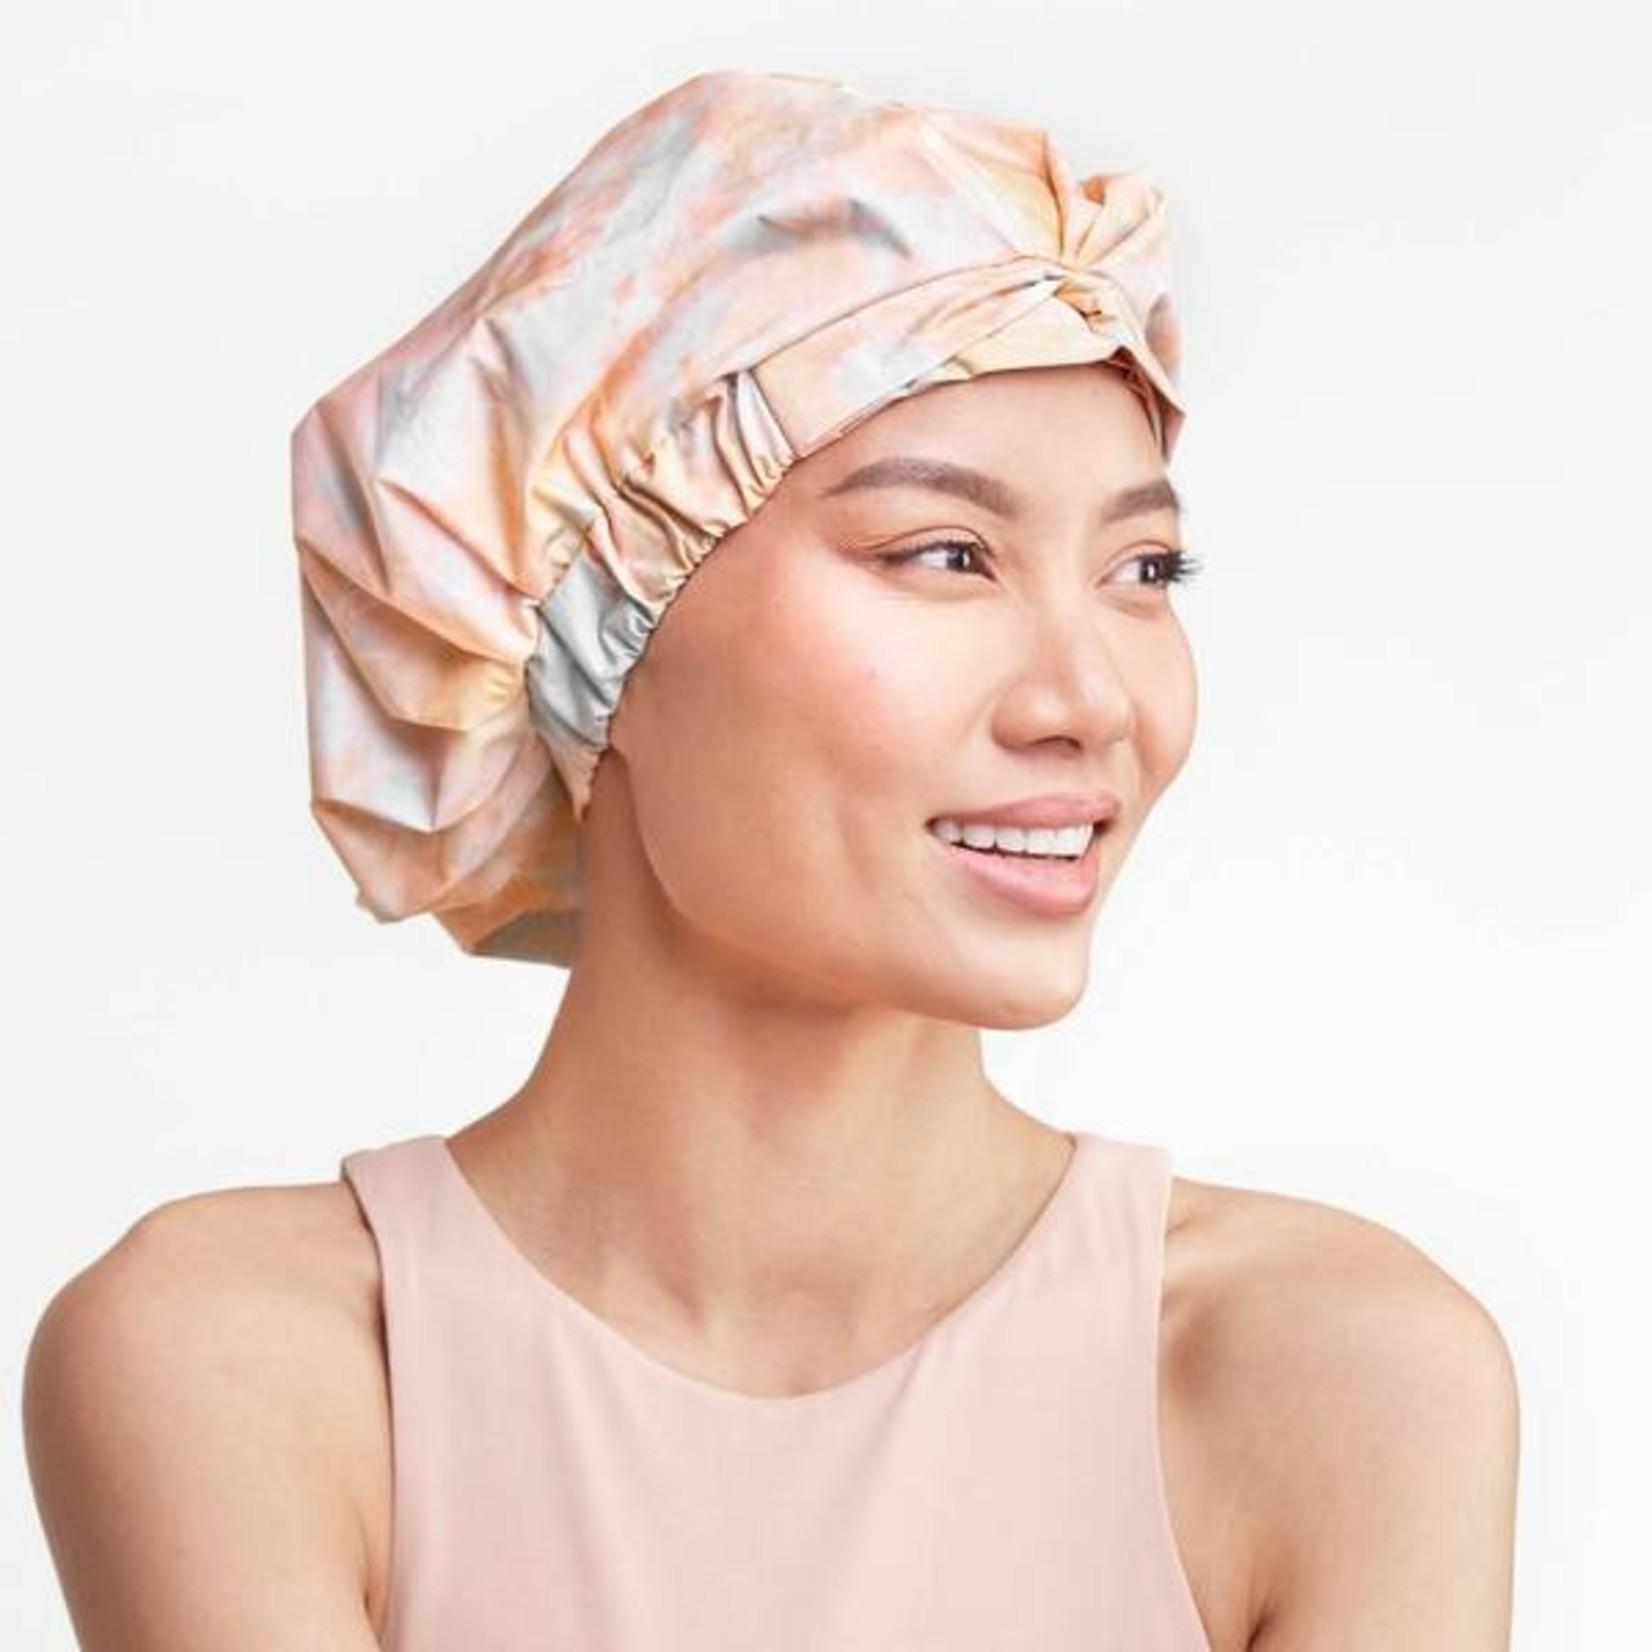 /KIT•SCH/ Luxe Shower Cap - Sunset Tie Dye